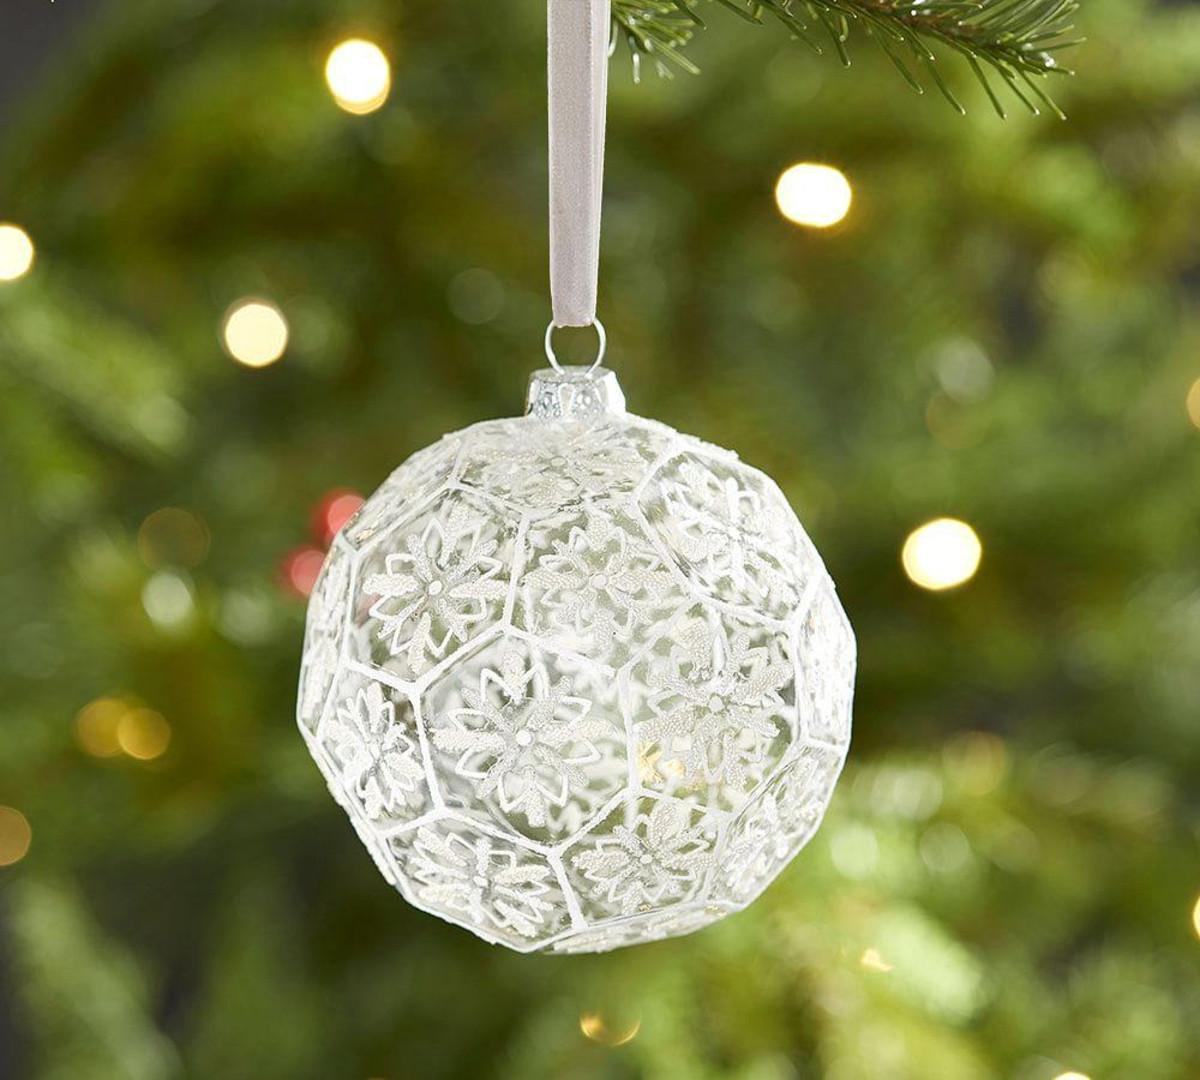 snowflake-glass-ball-ornament-z.jpg